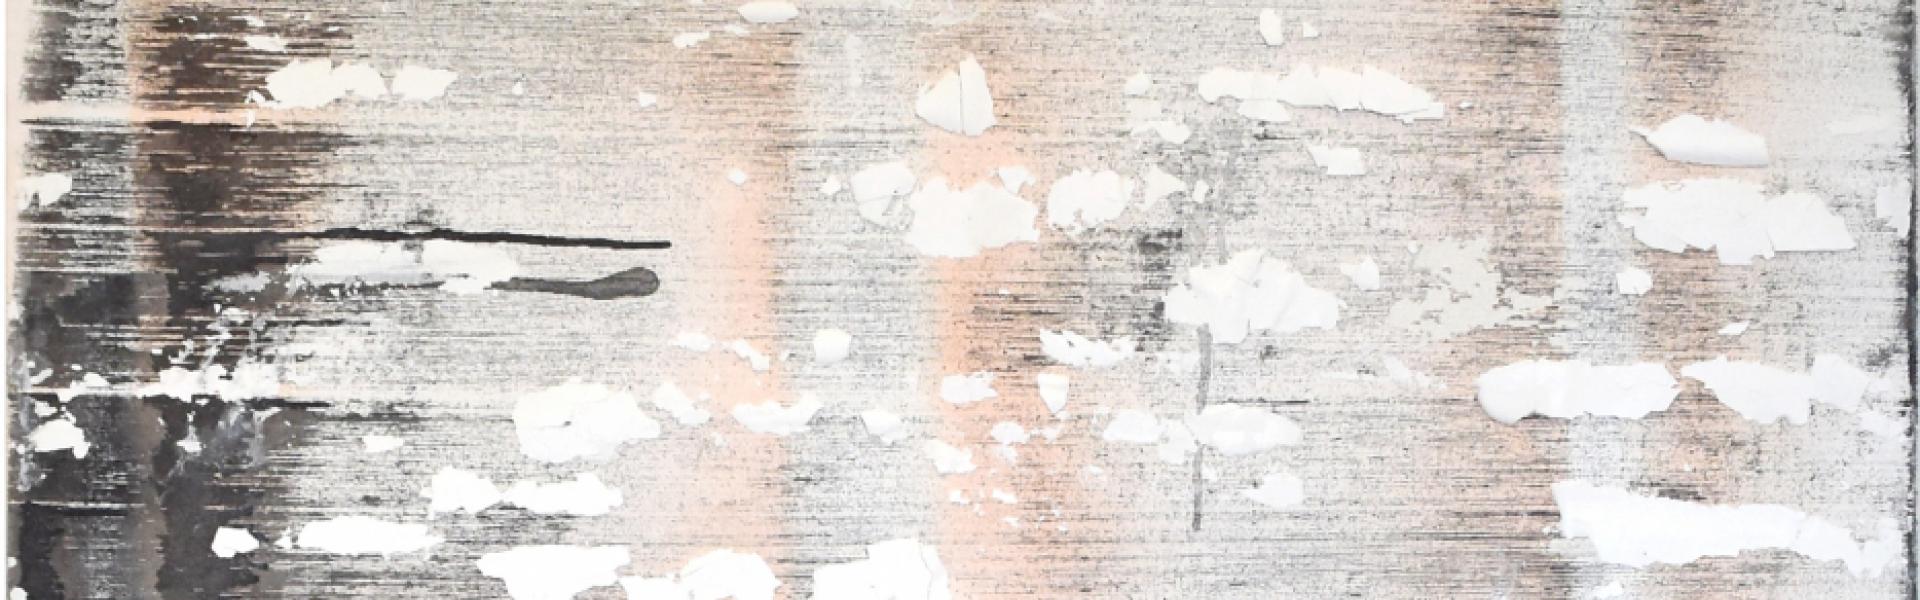 banner_Lori-Harrison-Morning-Practice-30-x40-2021-TOAF-banner.20210518210249.jpg